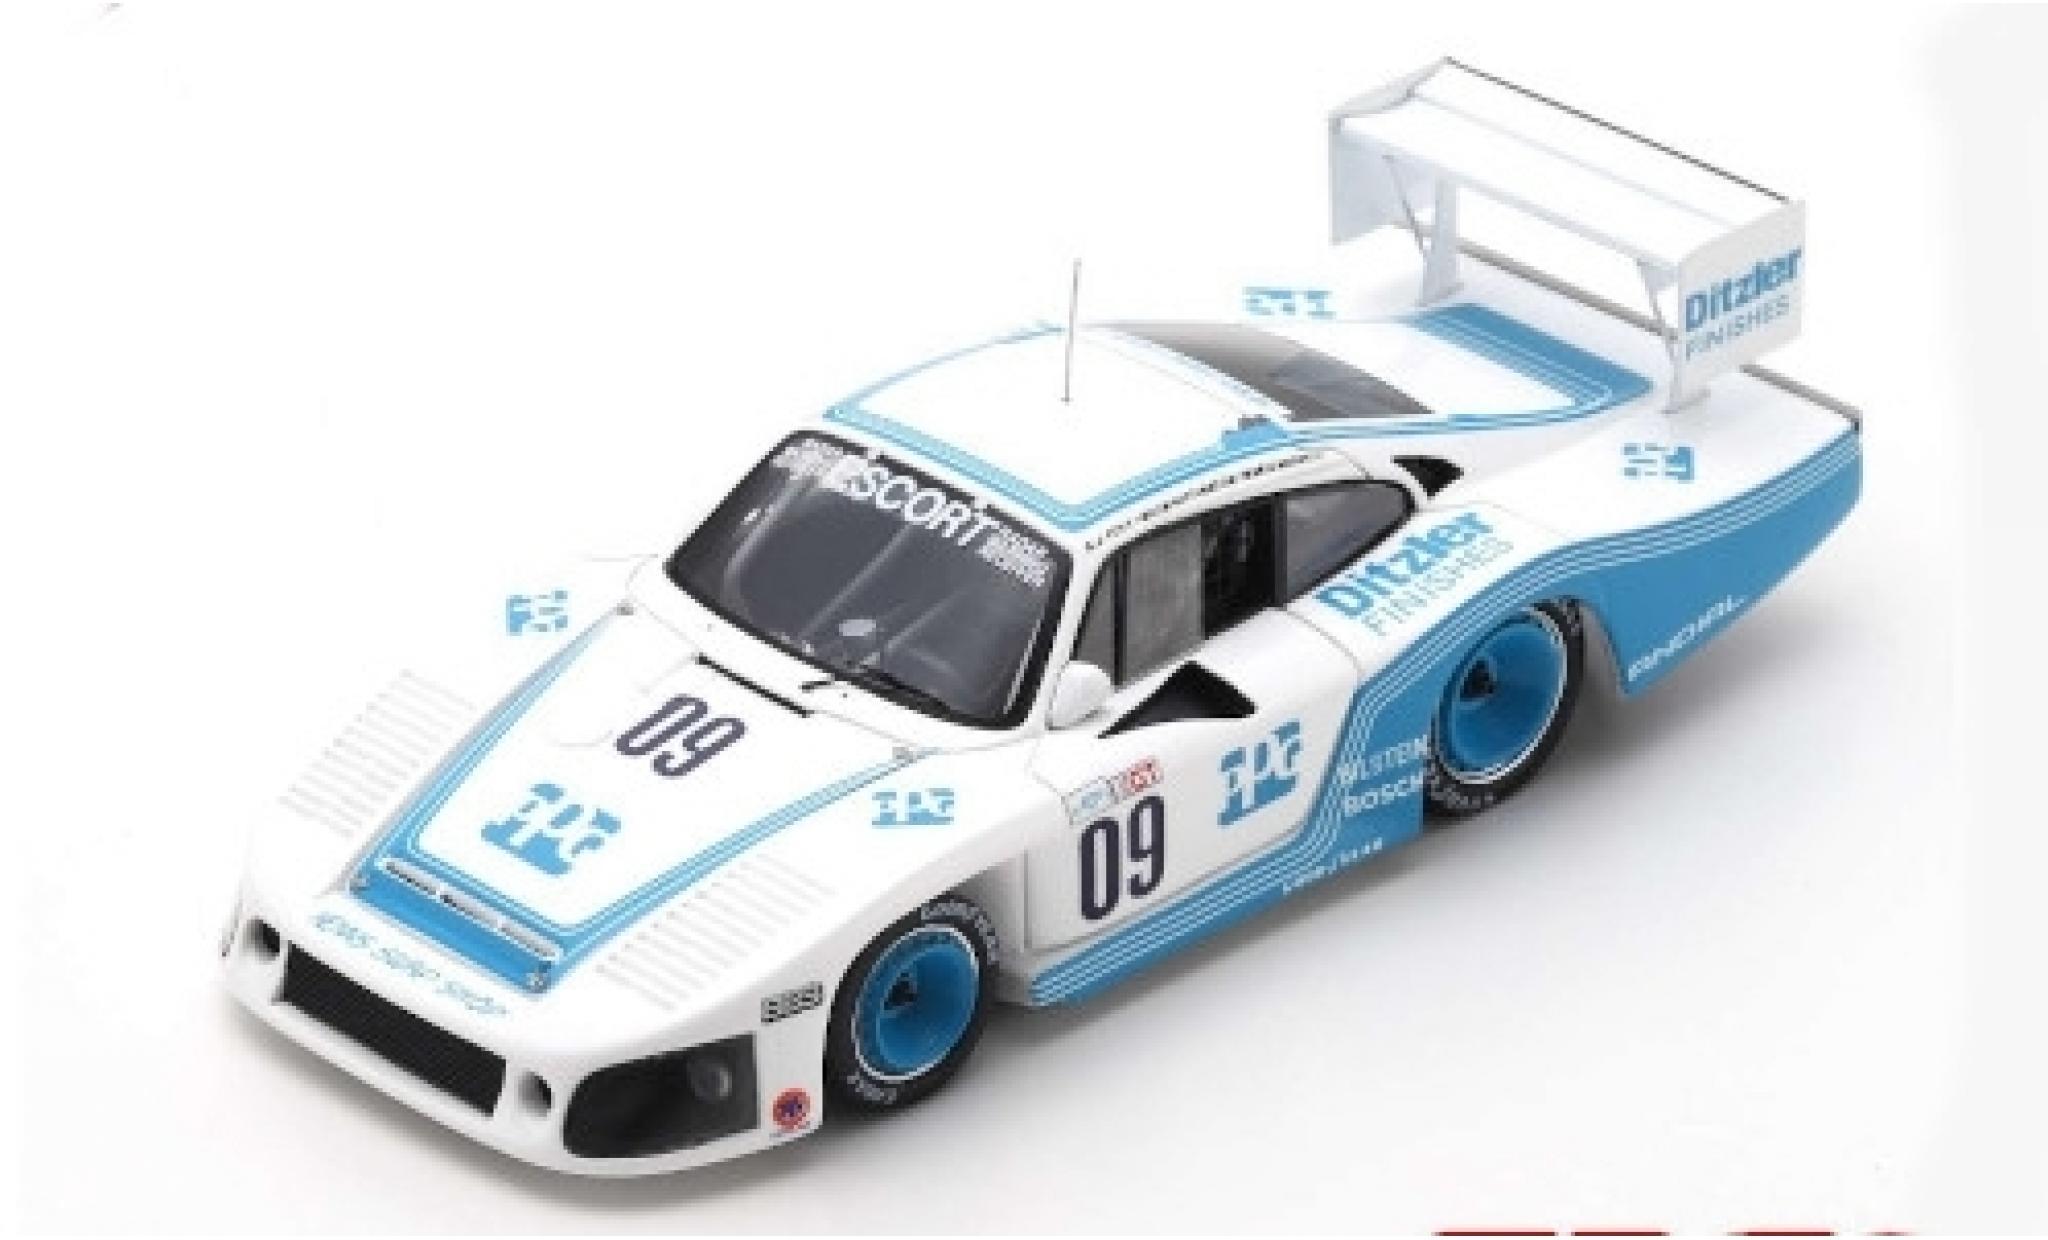 Porsche 935 1/43 Spark No.09 6h Riverside 1983 M.Andretti/A.J.Foyt/B.Whittington